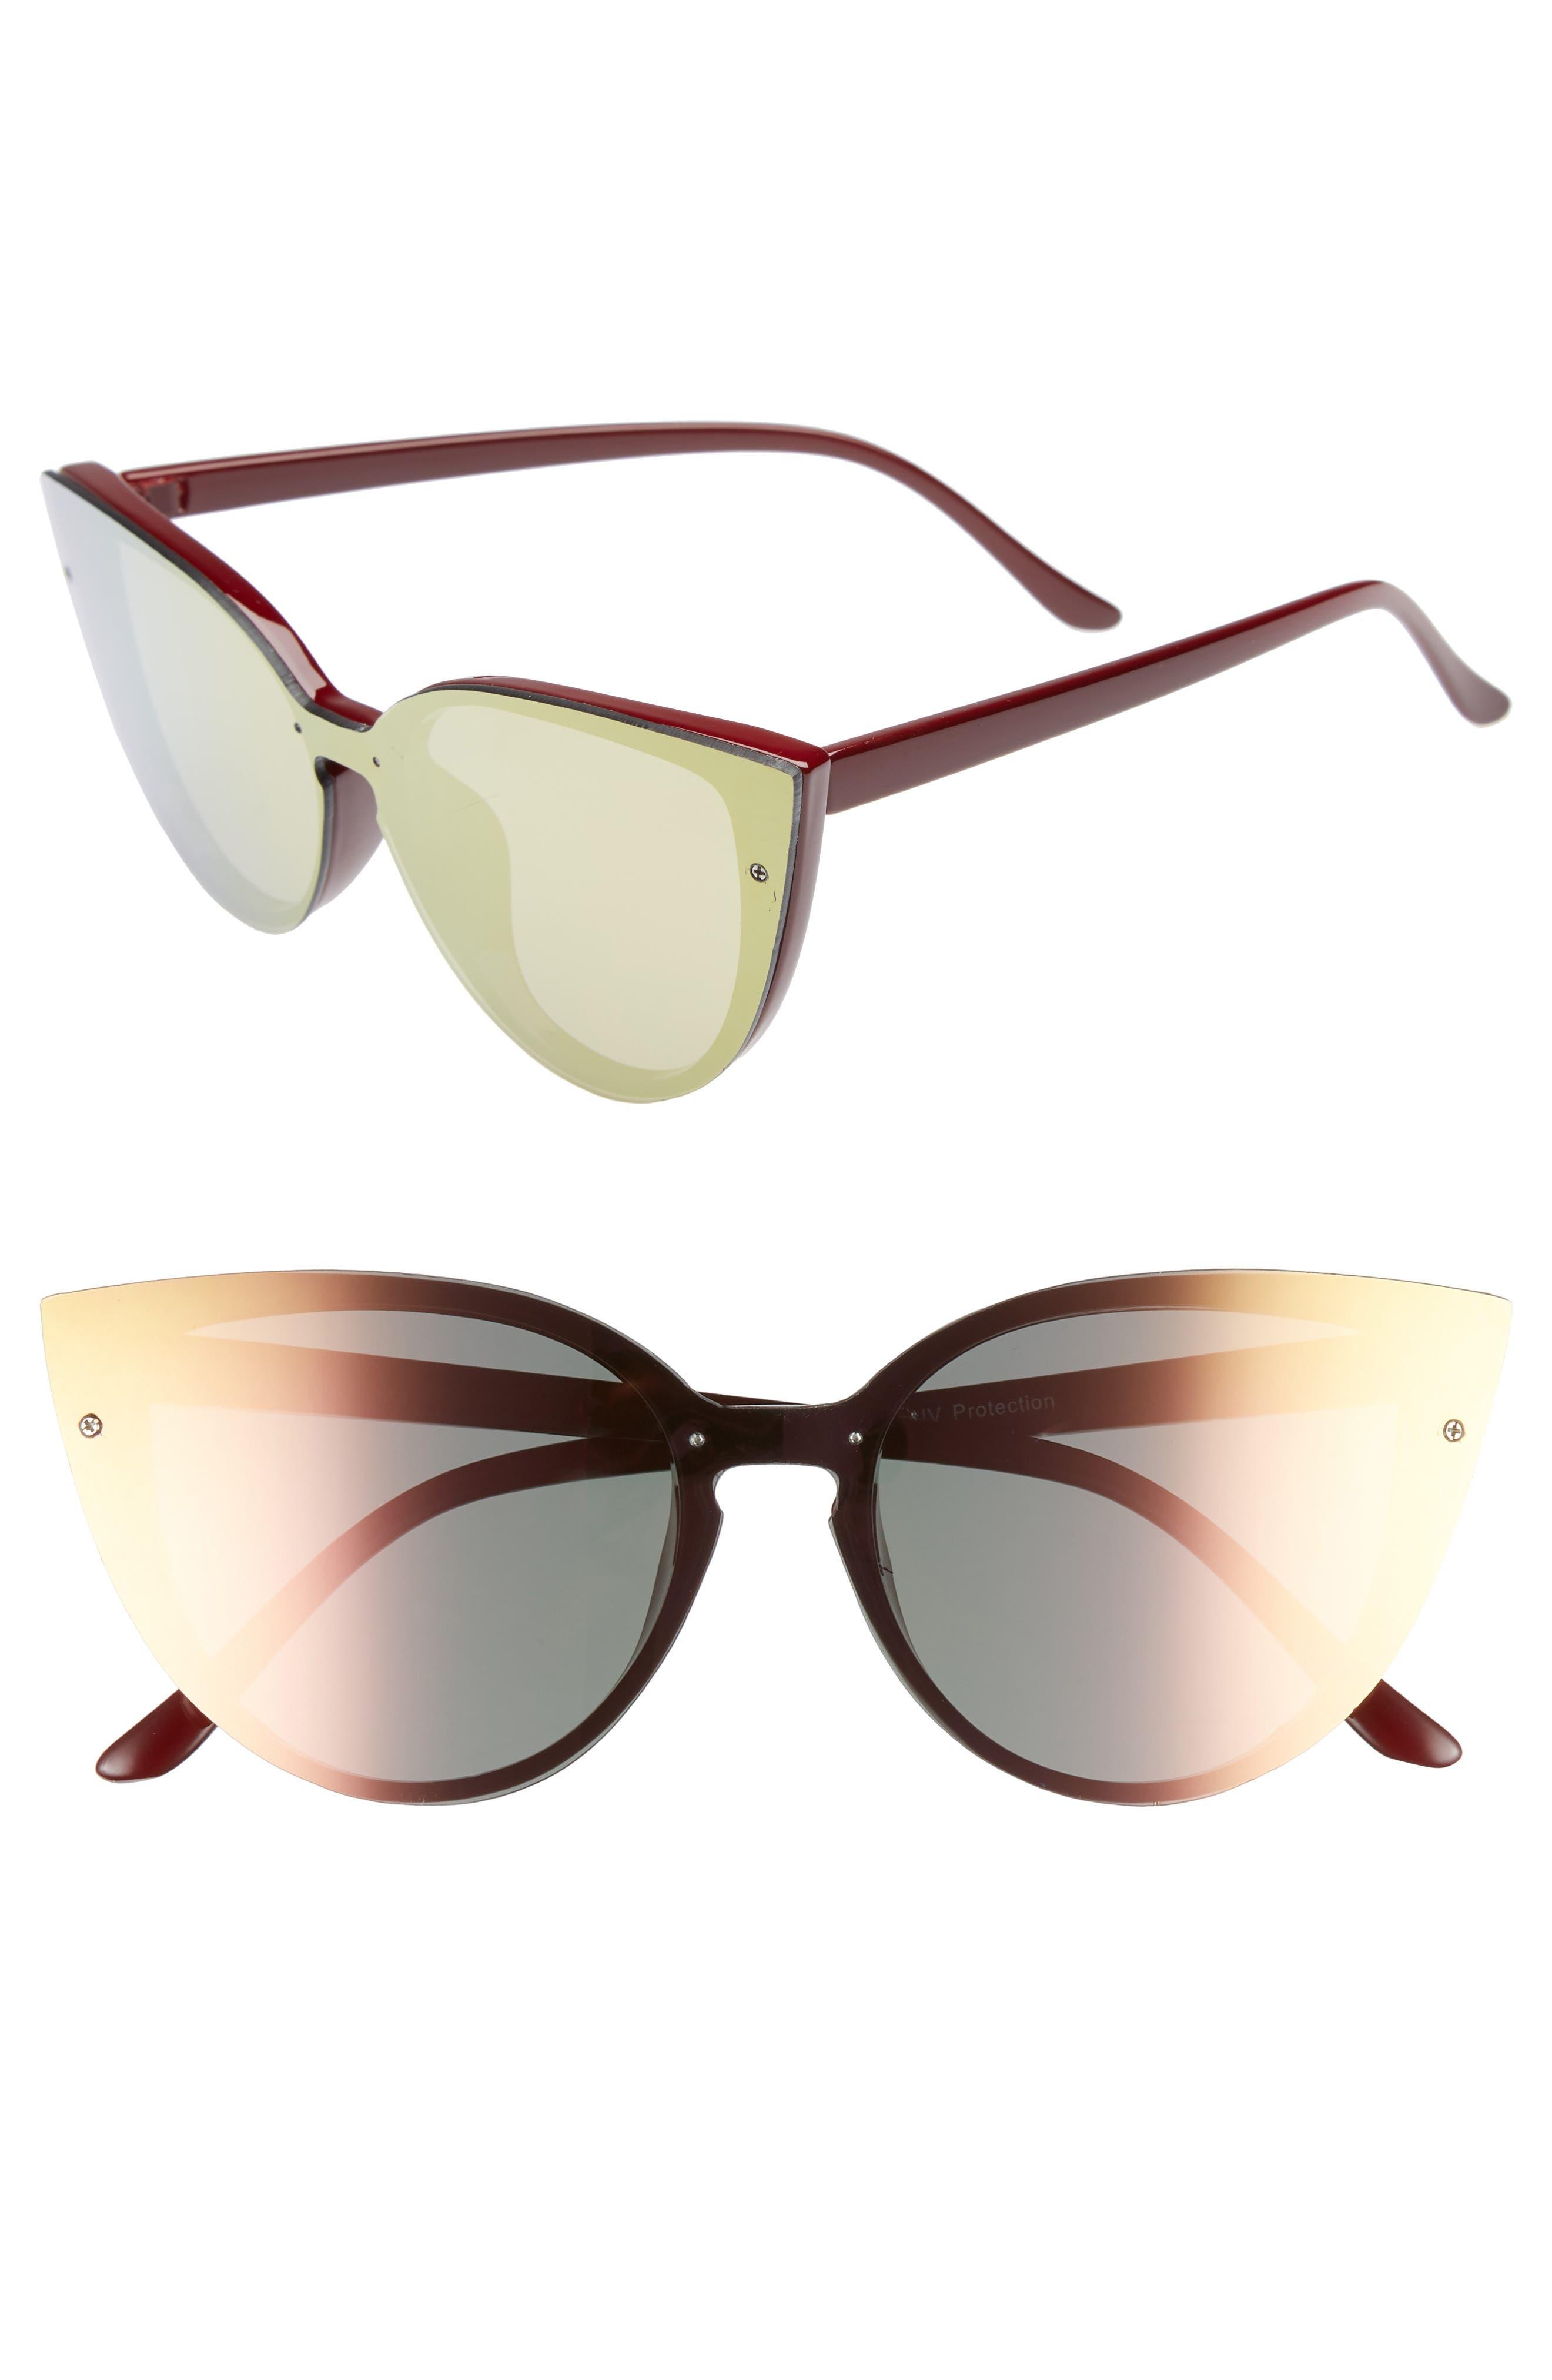 52mm Flat Cat Eye Sunglasses,                             Main thumbnail 1, color,                             Burgundy/ Green